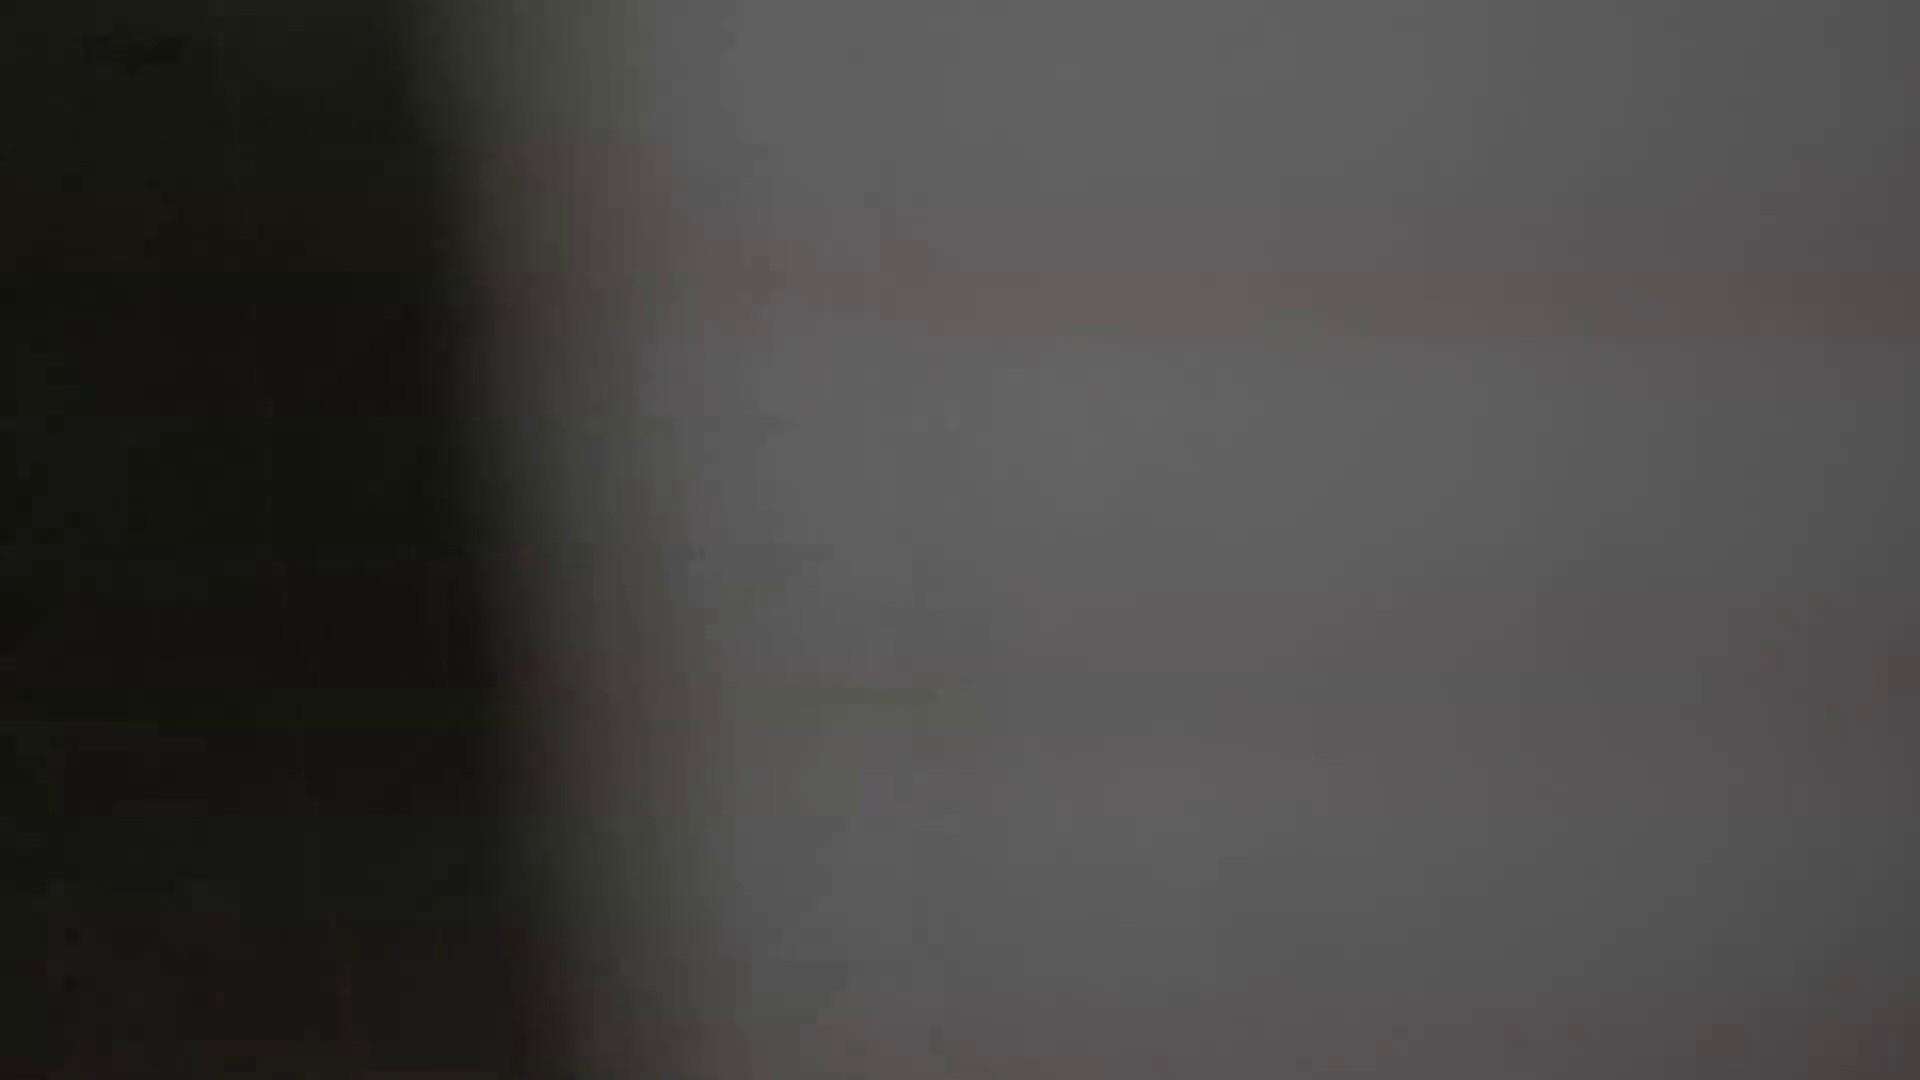 化粧室絵巻 駅舎編 VOL.05 盛合せ セックス画像 83画像 53